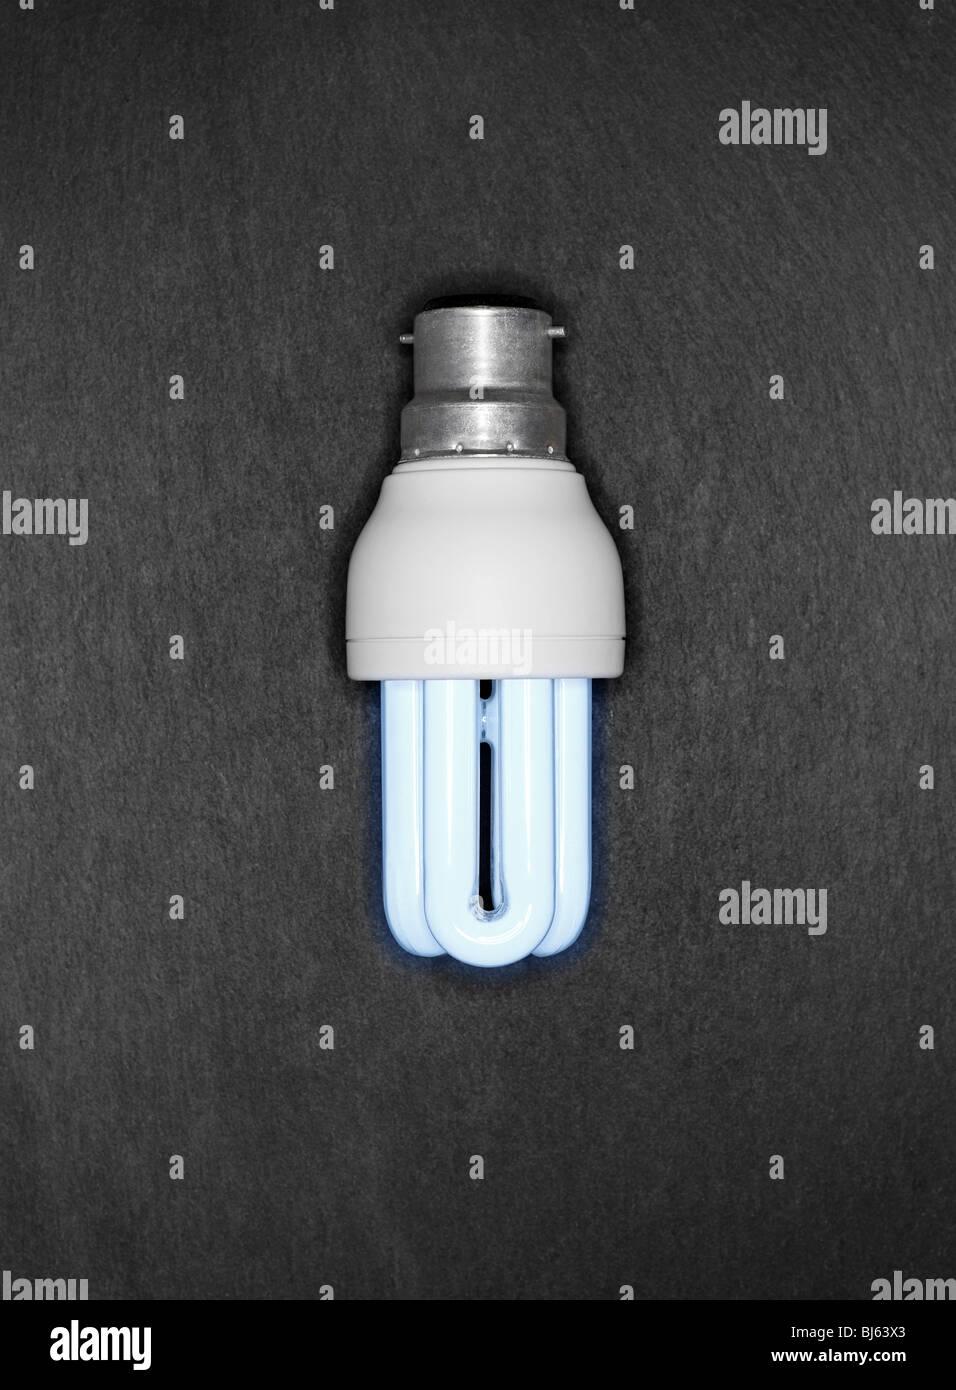 Cool Blue Light Bulbs: Cool Blue Energy Saver Light Bulb on a Grey Slate Background,Lighting